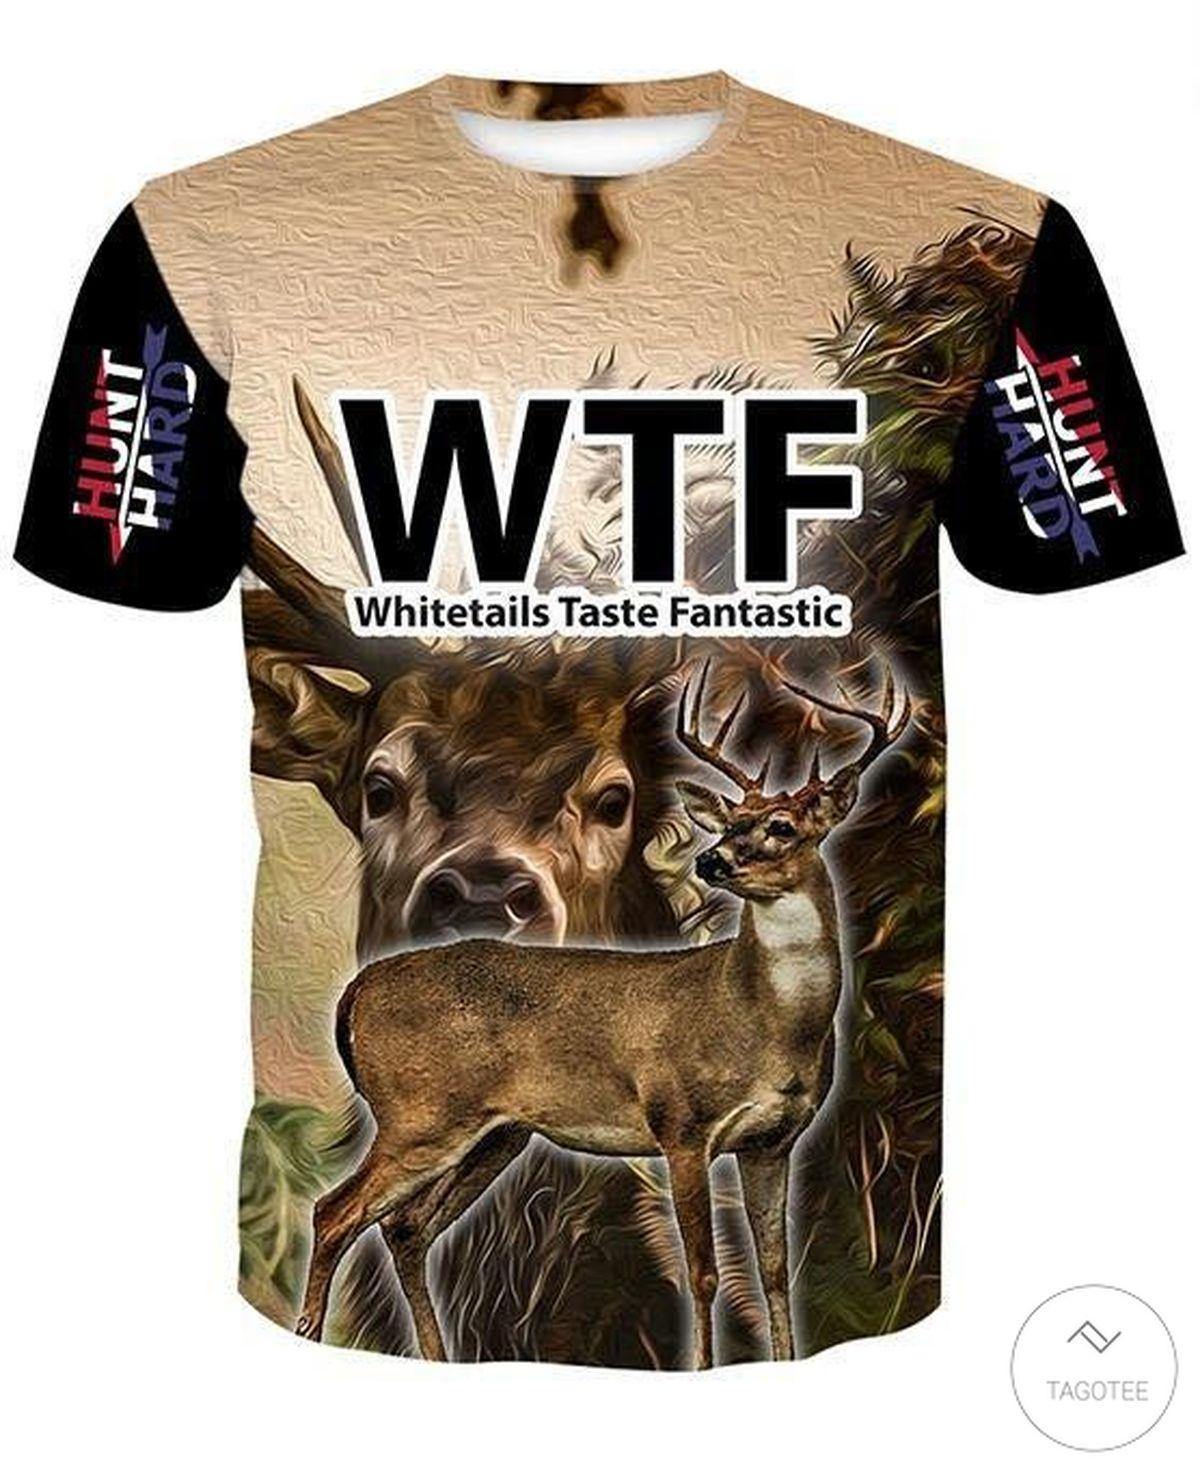 WTF Whitetails Taste Fantastic 3D T-shirt